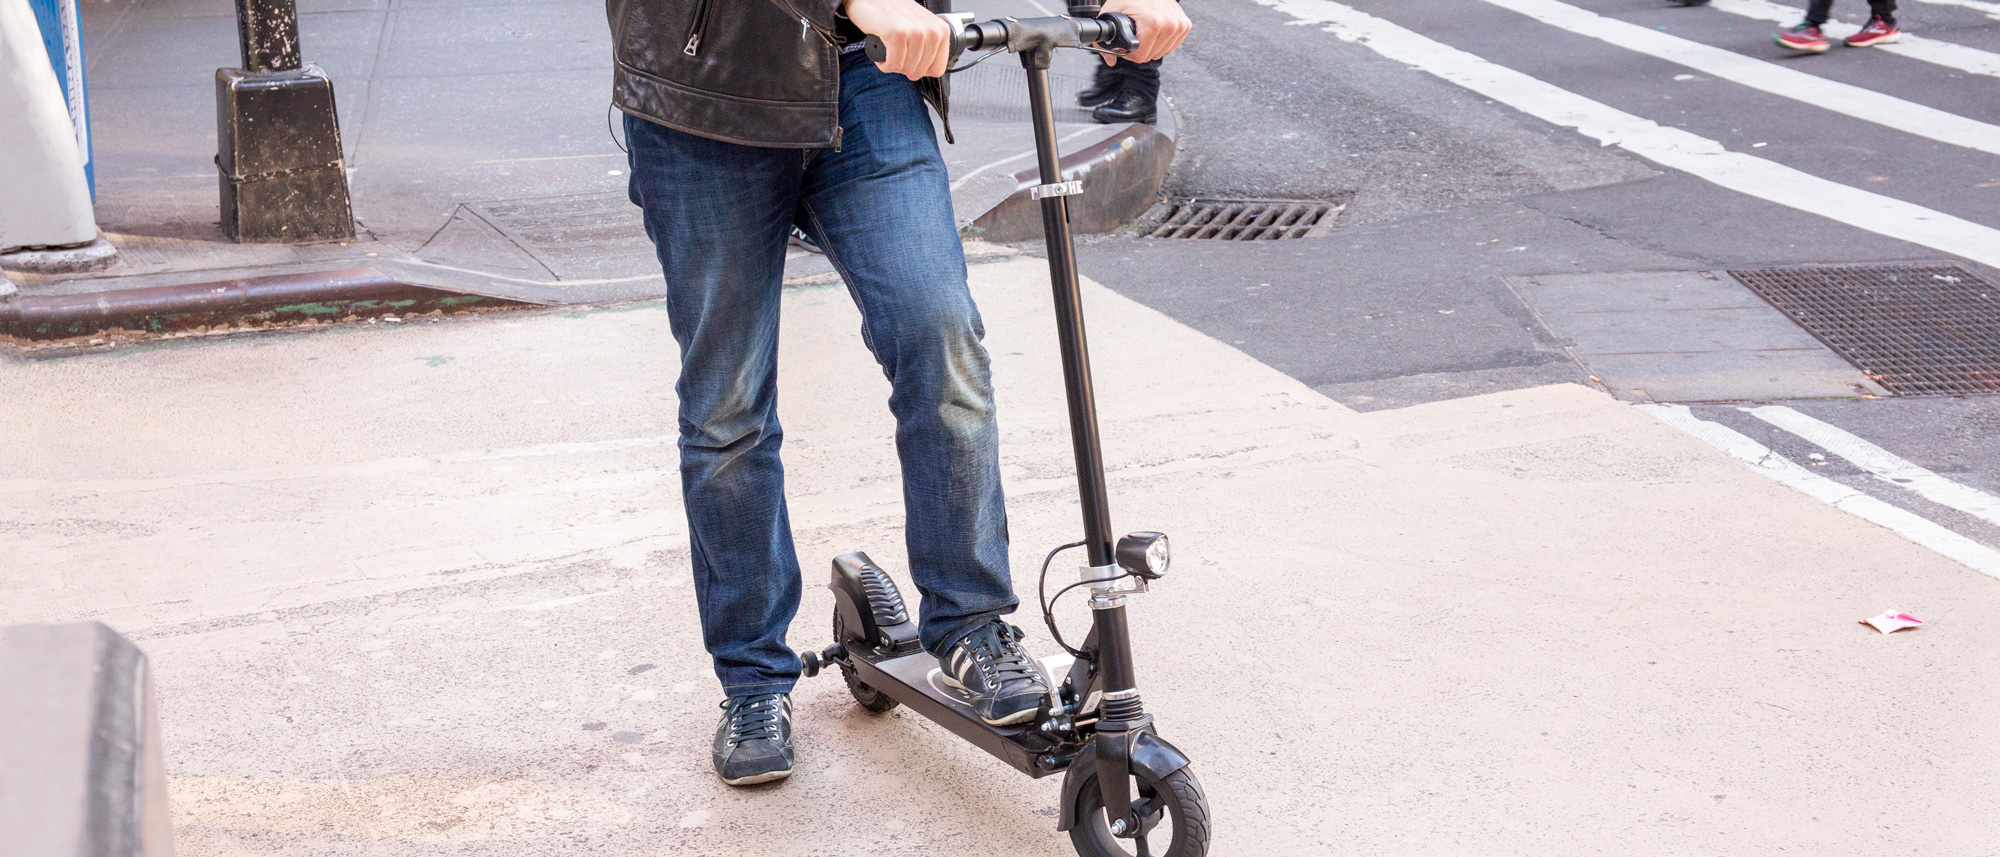 Melhores scooters elétricas: Glion Dolly